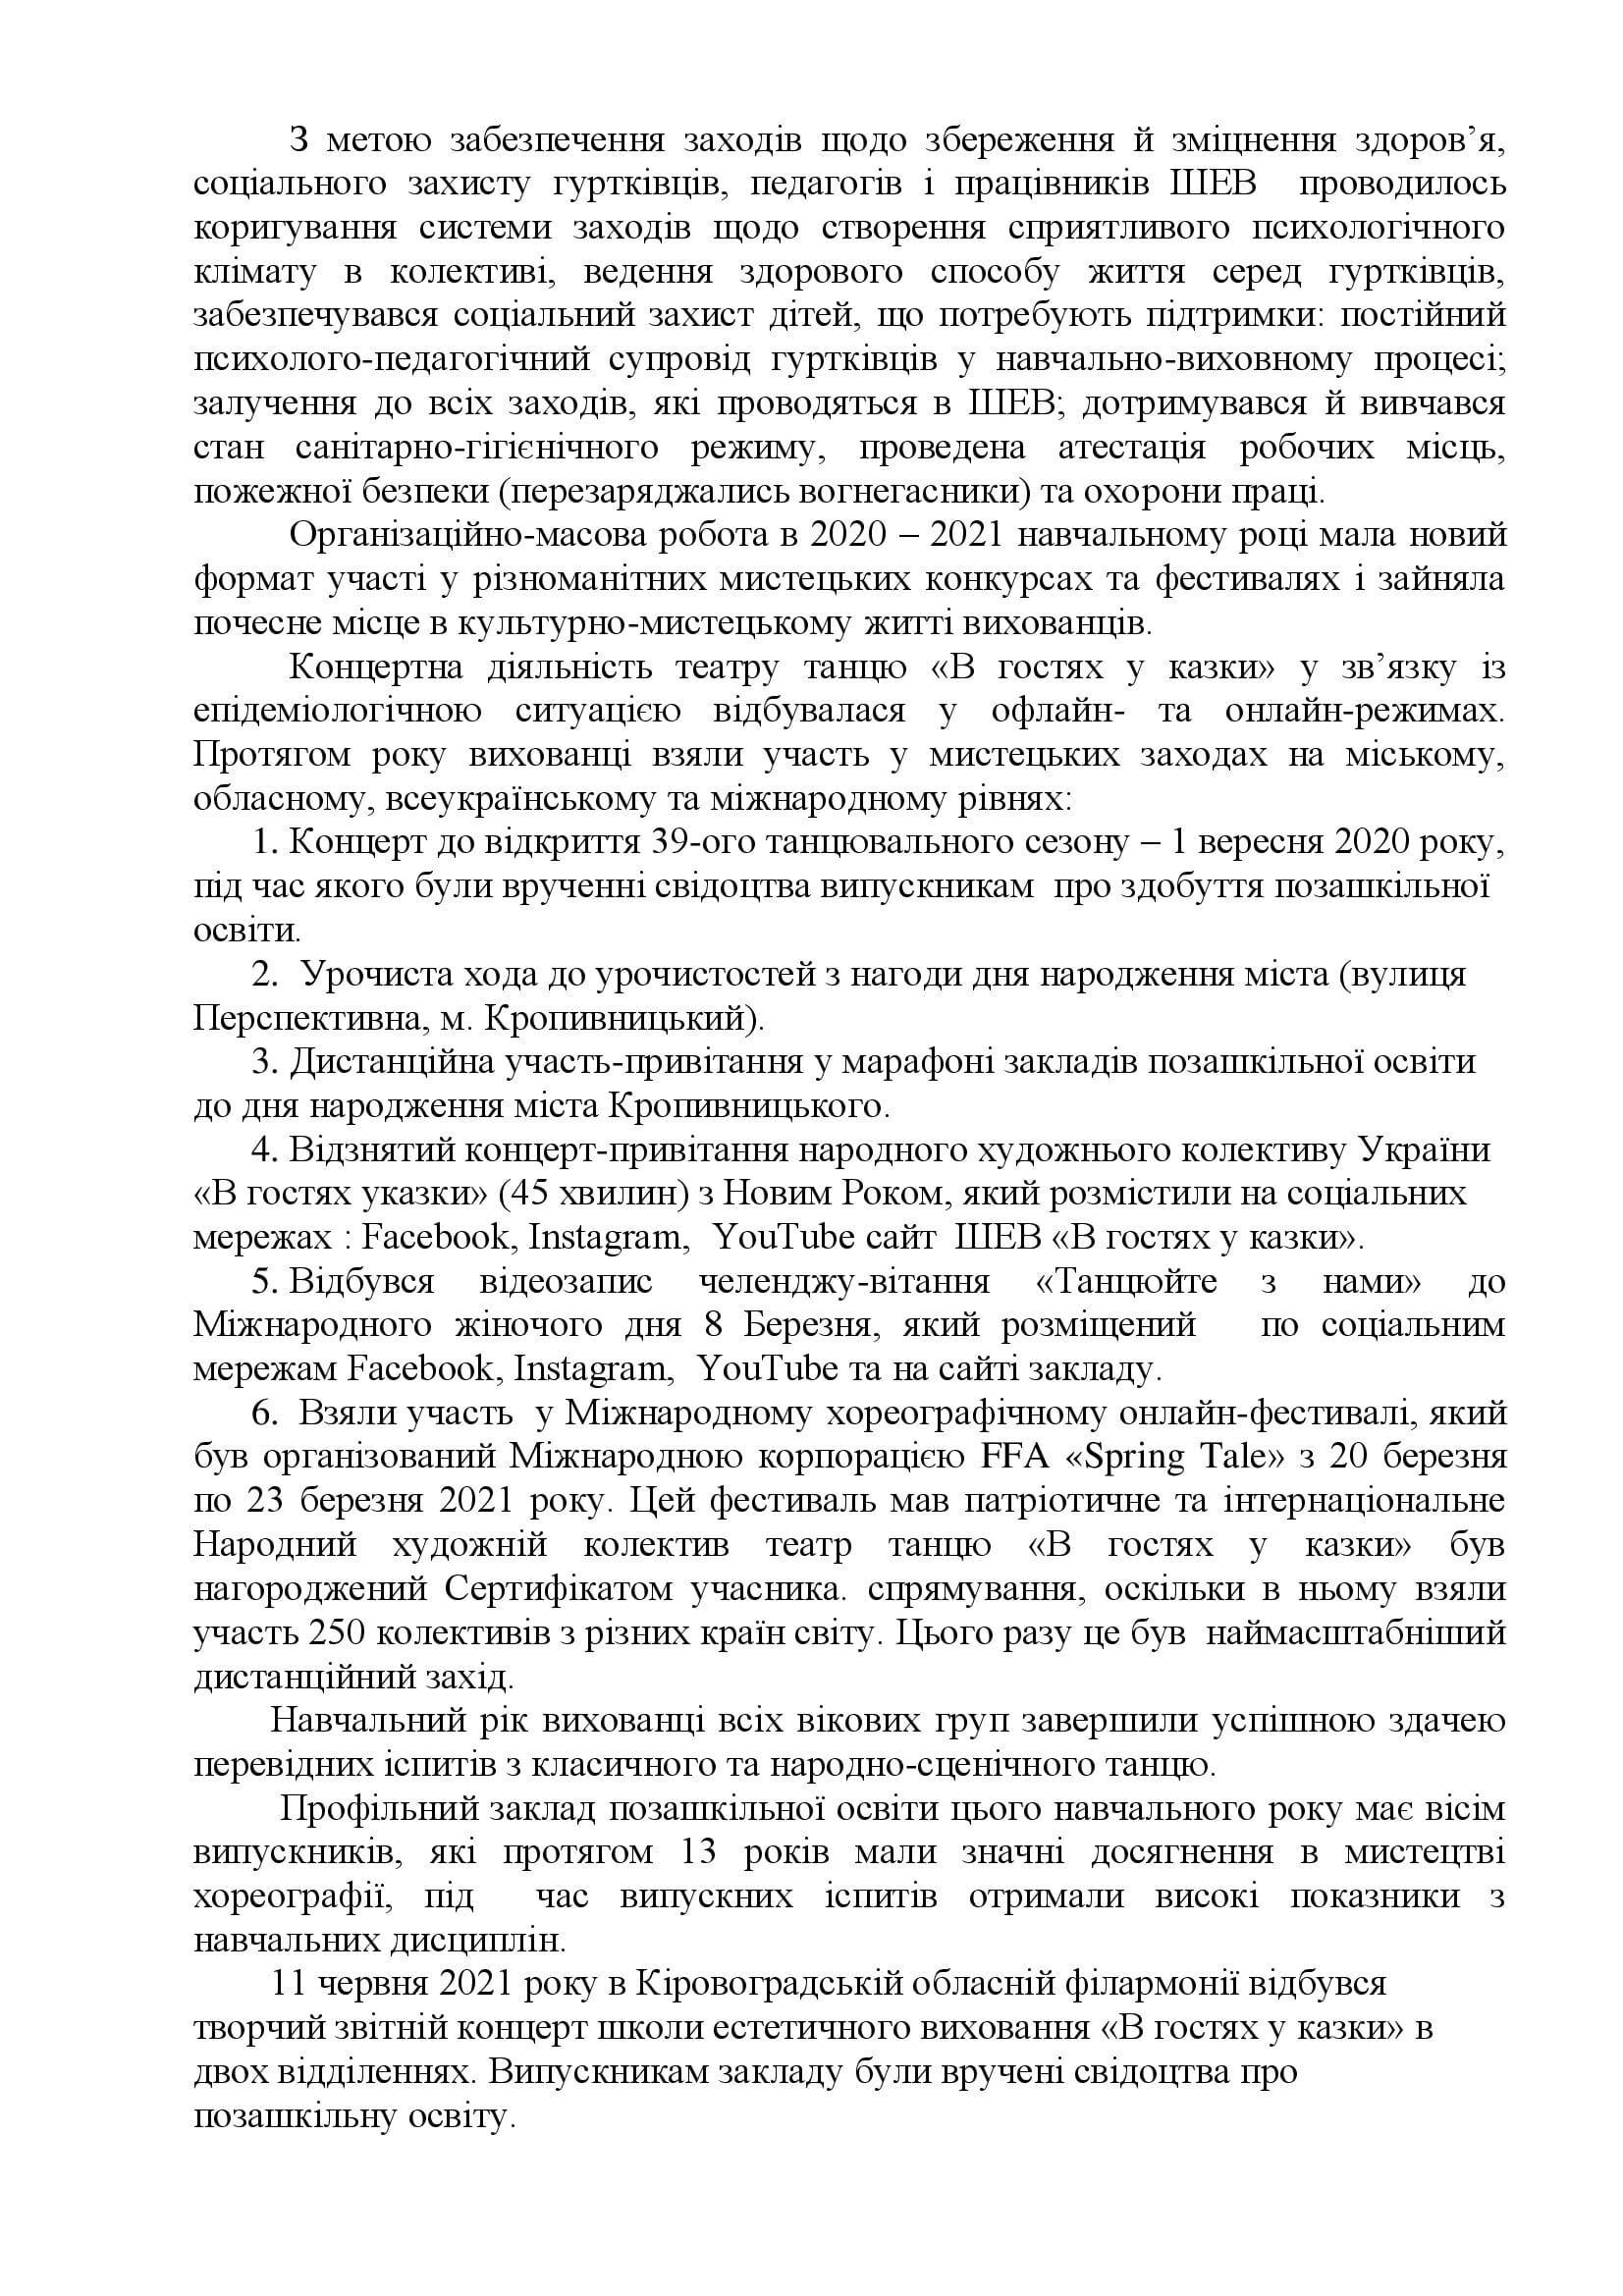 План роботи ШЕВ В гостях у казки  2021-2022_00010